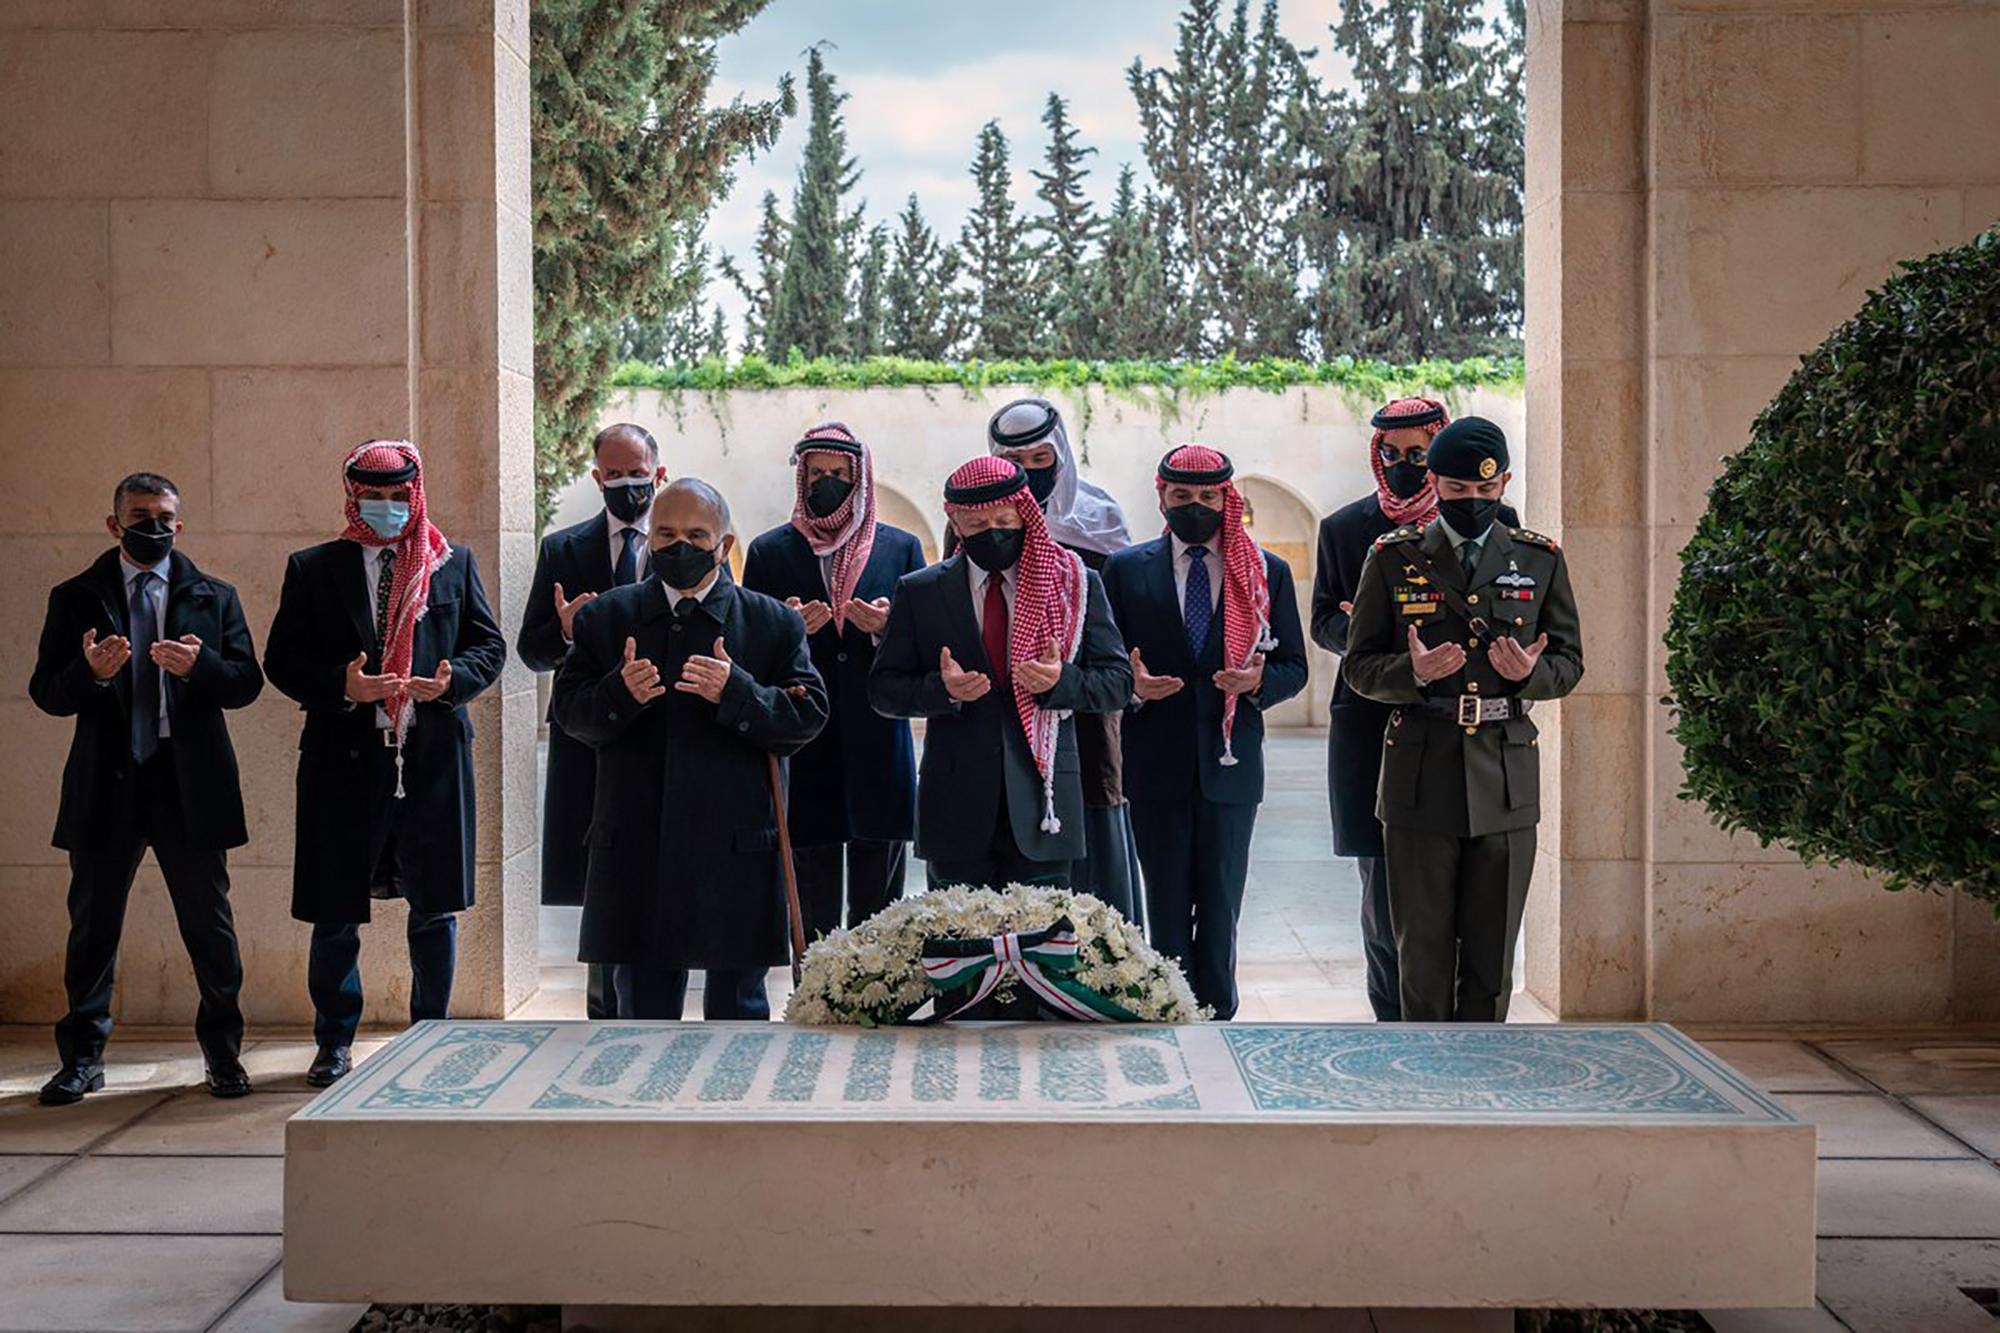 Jordanian prince makes first public appearance since arrest